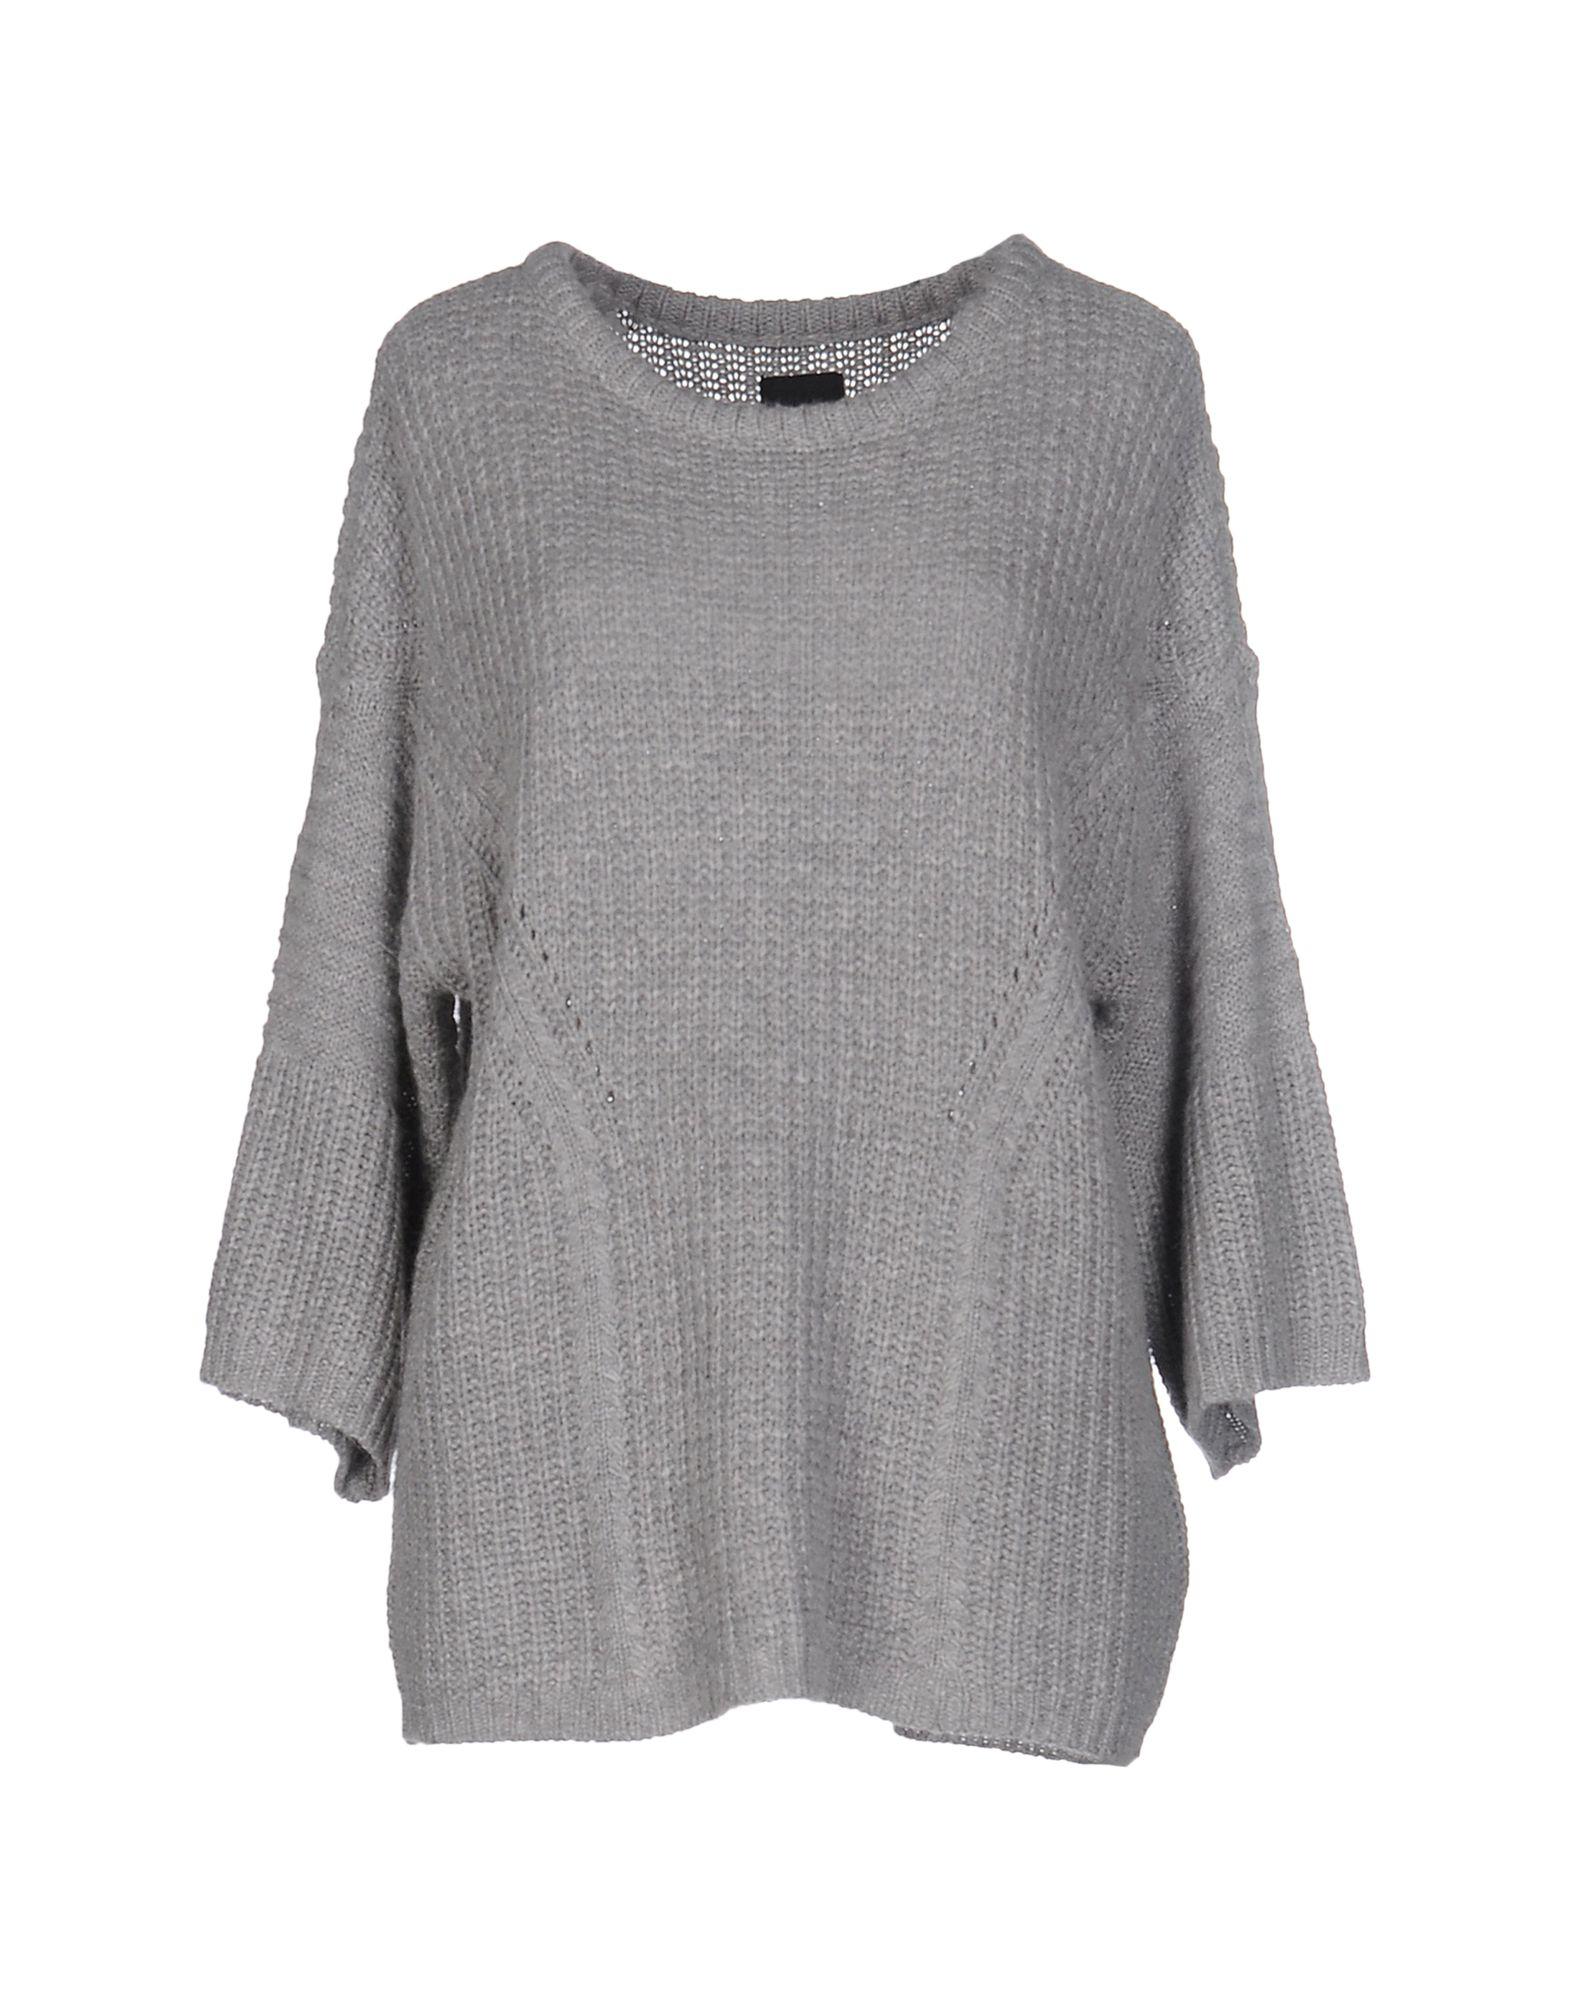 SELECTED FEMME Свитер свитер selected femme selected femme se781ewfkux8